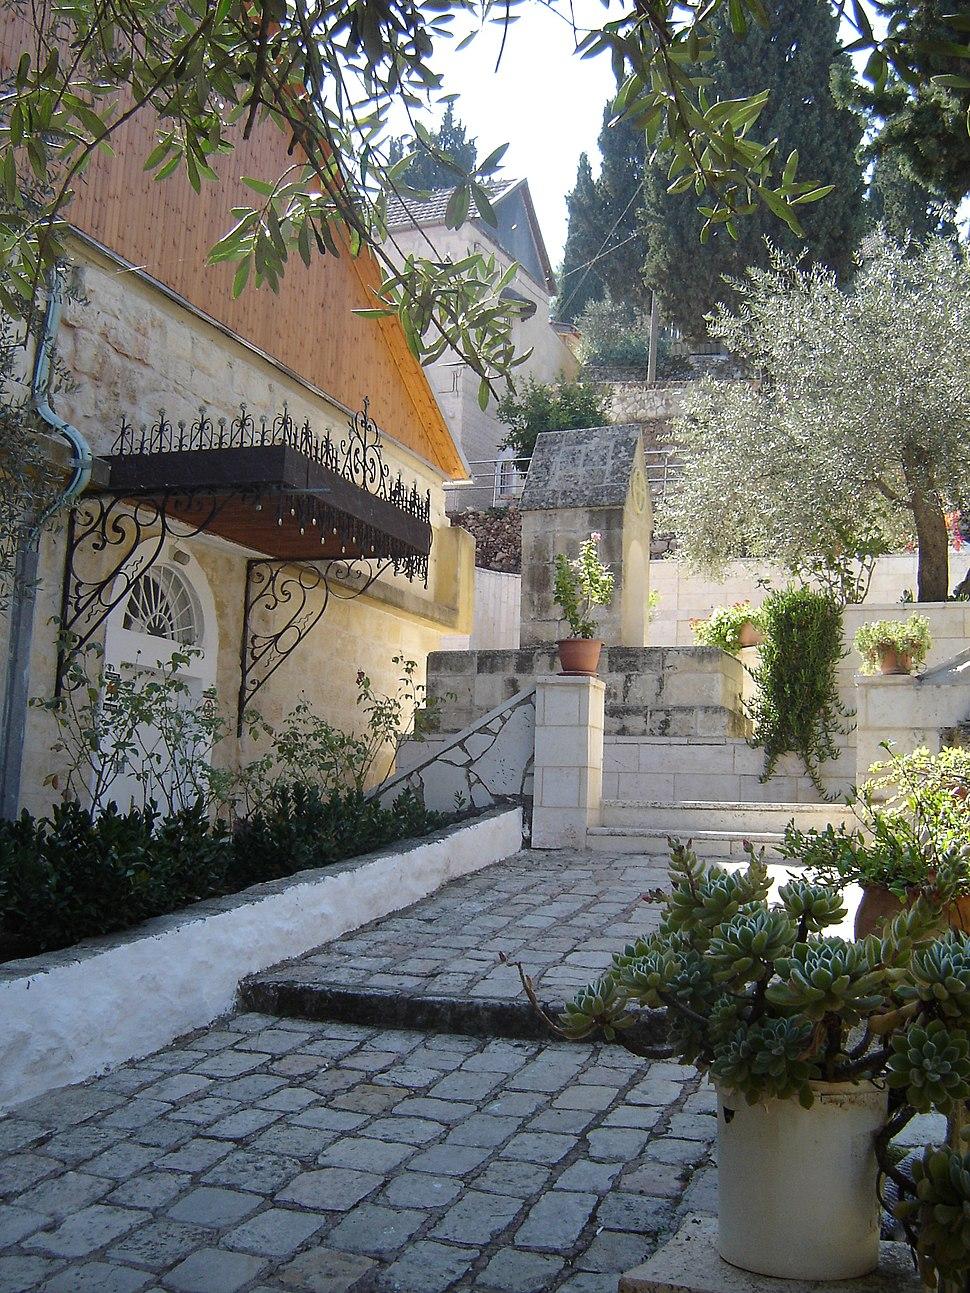 Path way in gorney monastery